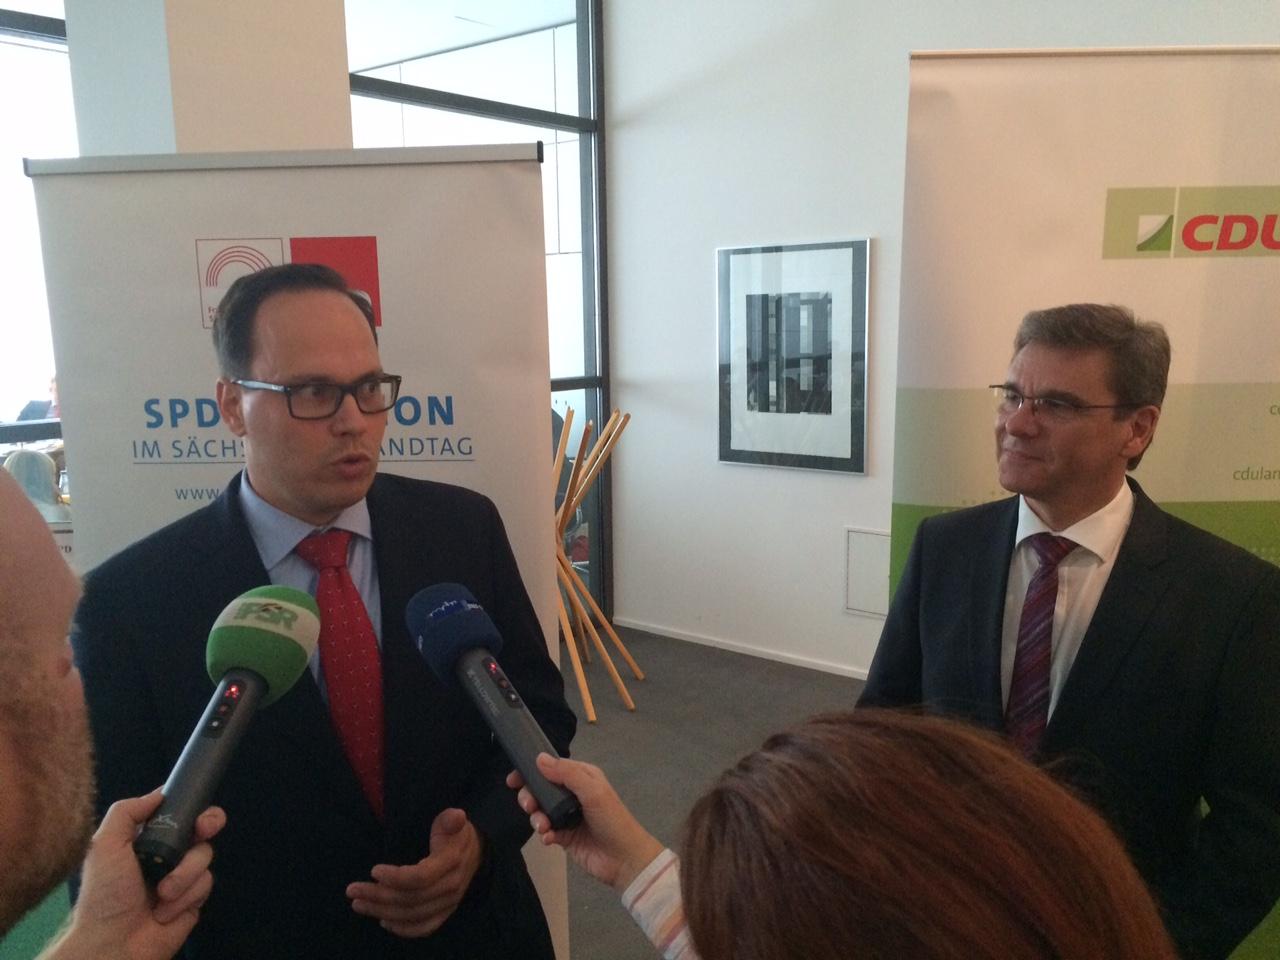 Koalition unterstützt Regierung bei Asylmaßnahmen